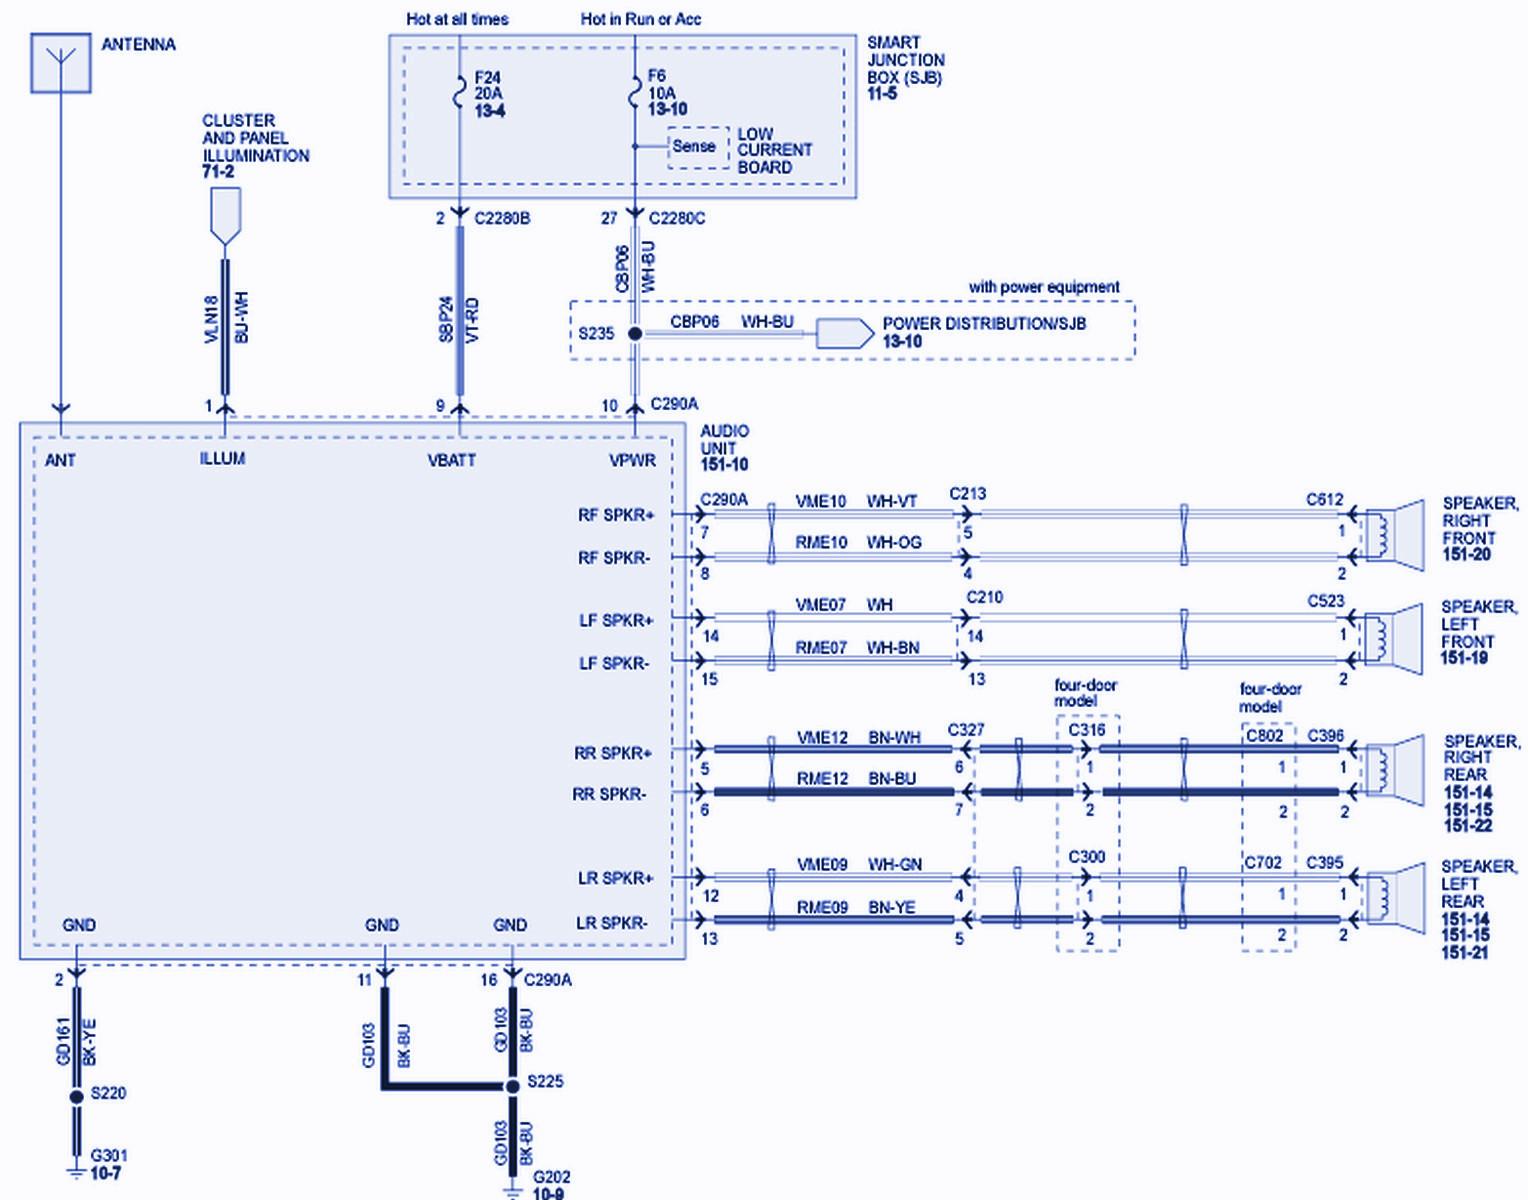 2010 f250 wiring diagram wiring diagram blog 2010 f350 wiring diagram 2010 f350 wiring diagram [ 1528 x 1200 Pixel ]